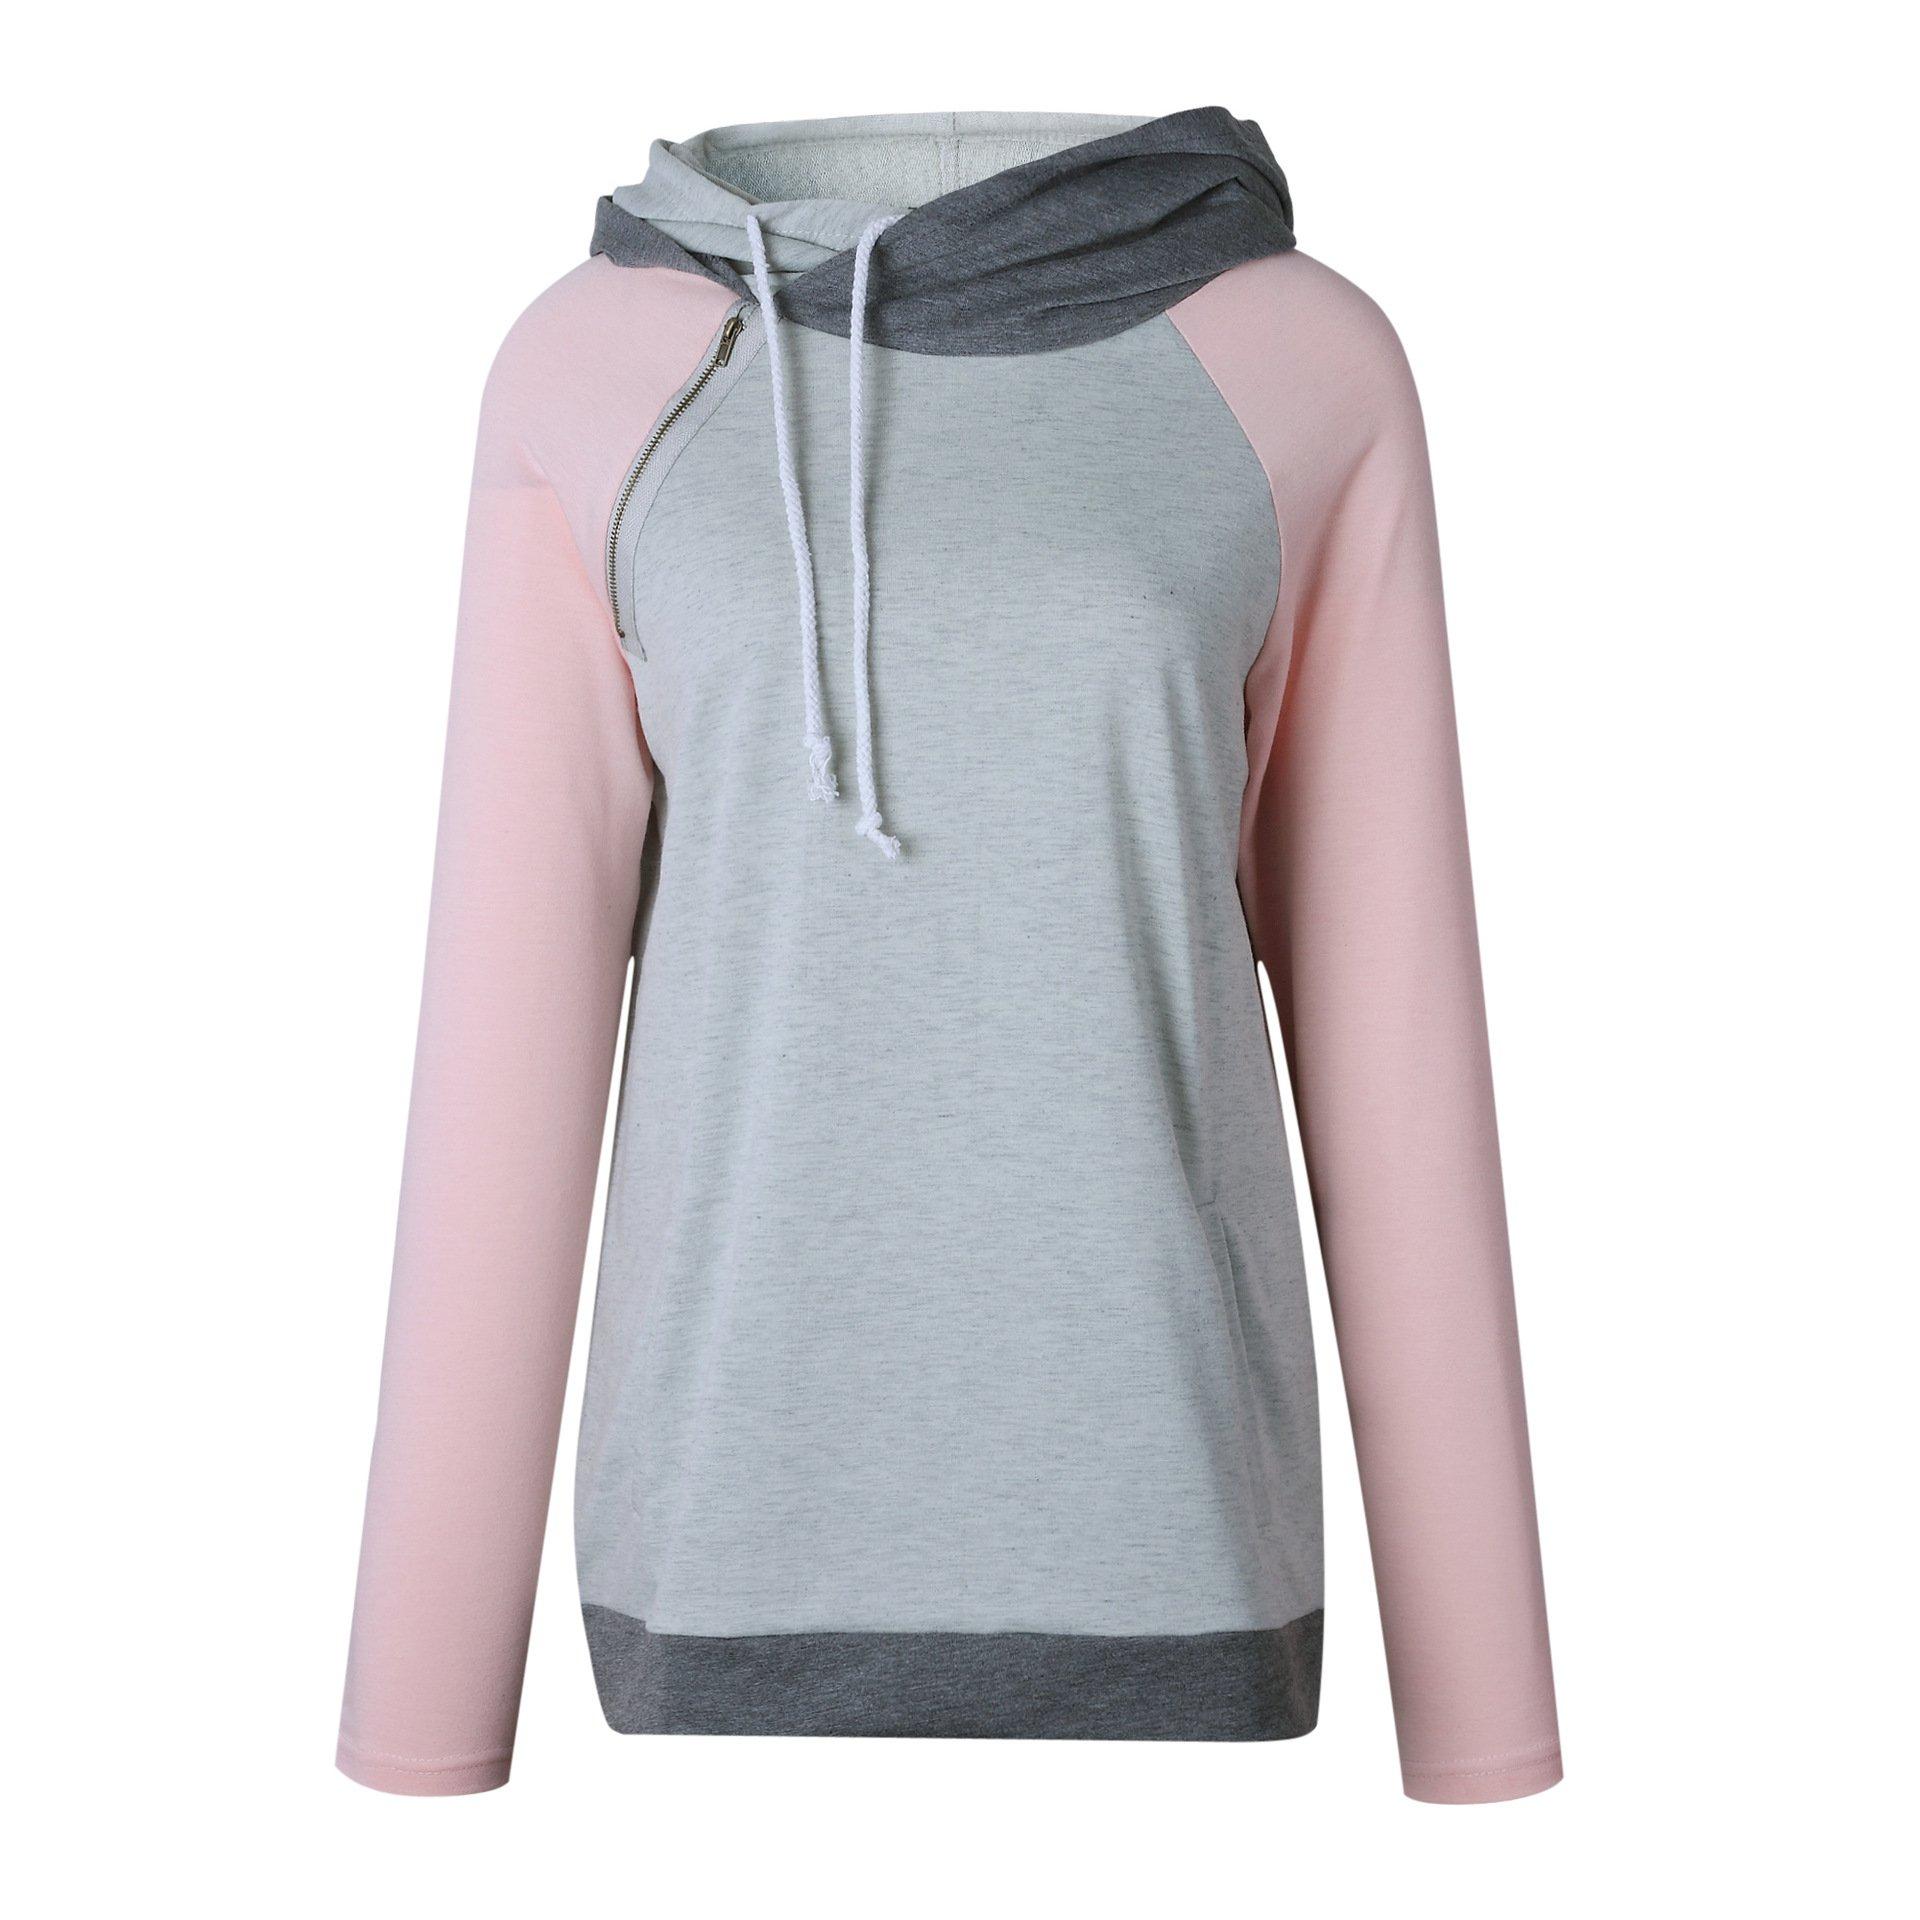 Famulily Women's Long Sleeve Baseball Doublehood Sweatshirt Colorblock Hoodies(Pink,X-Large)